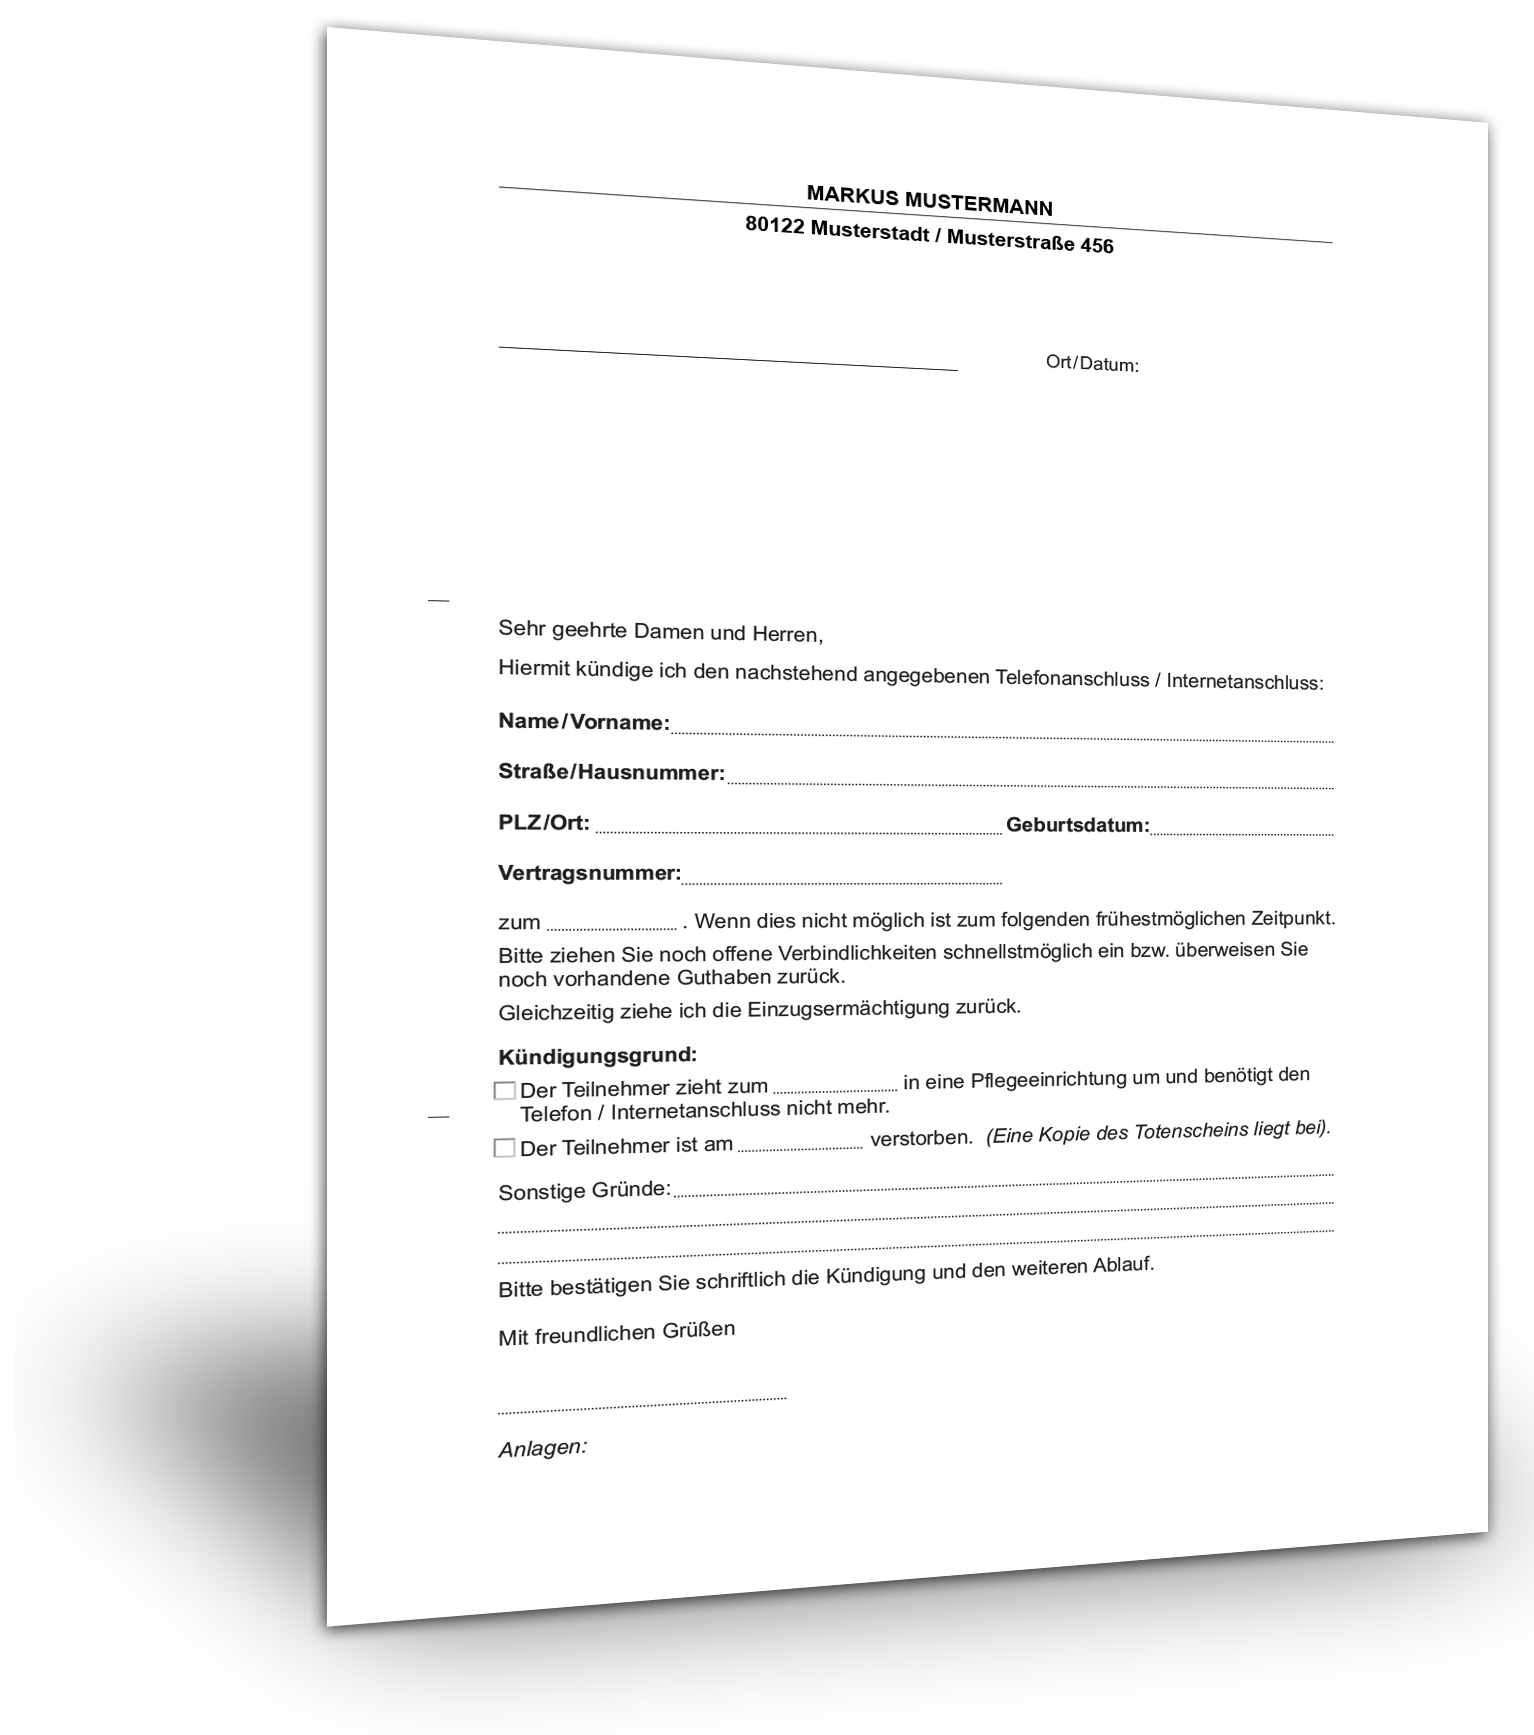 Kündigung Telefoninternet Muster Gratis Download